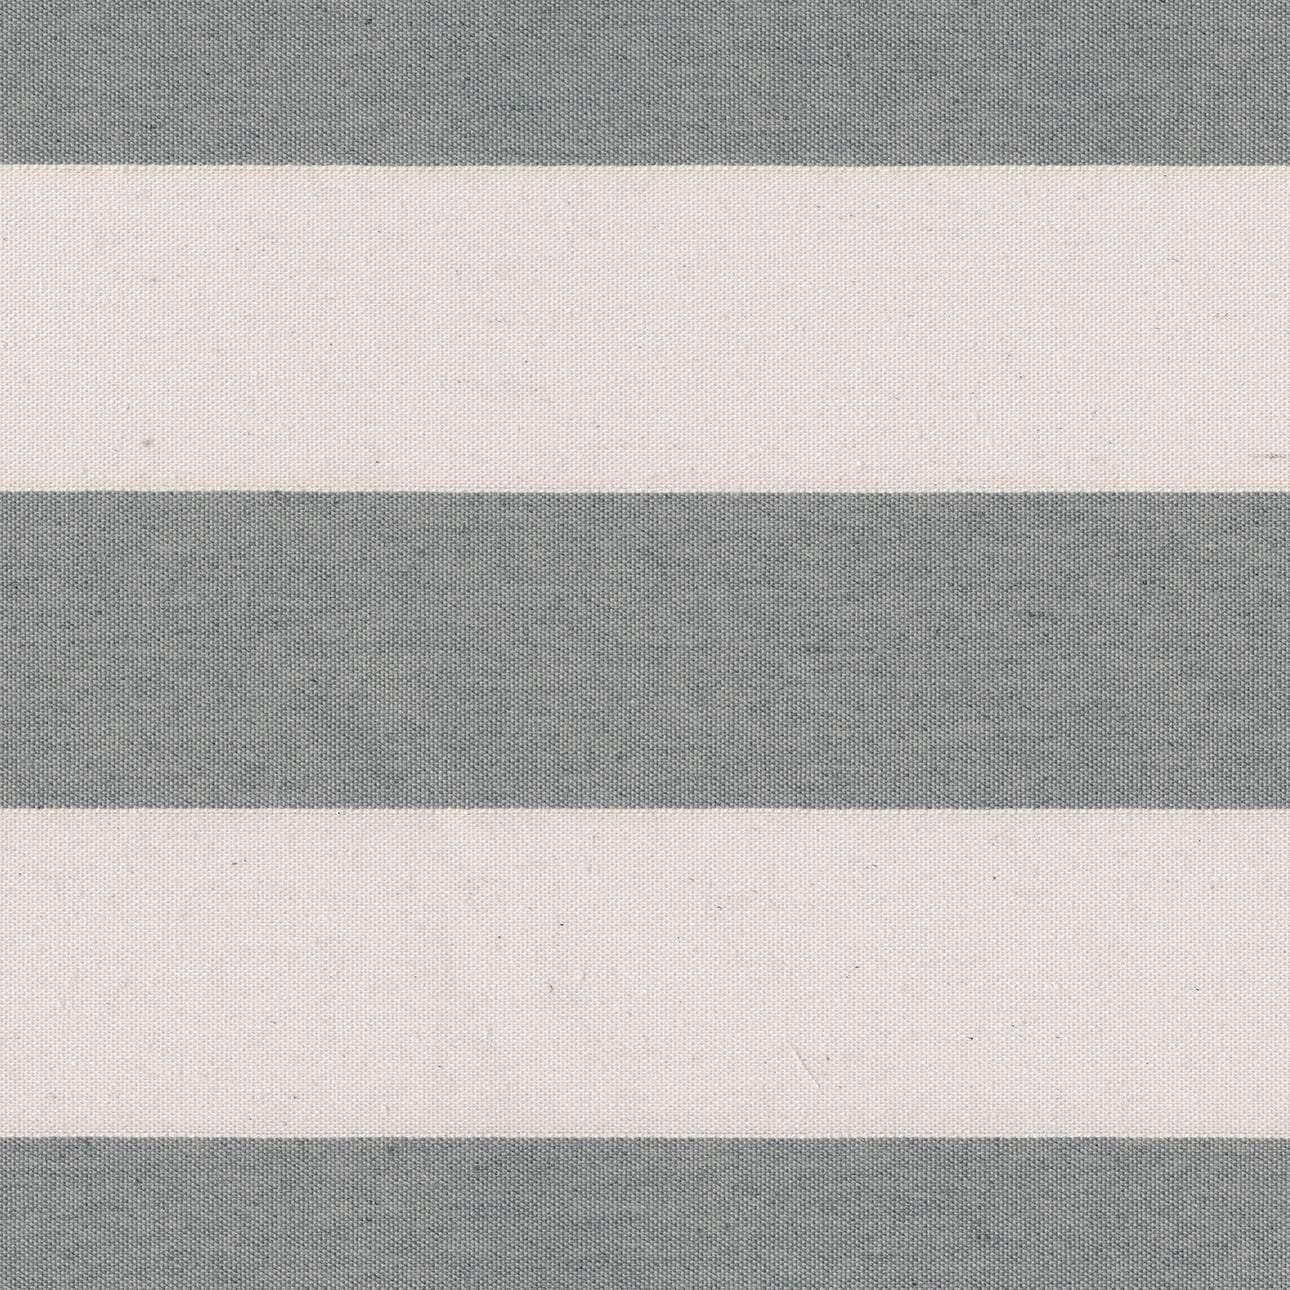 Quadro 142-71 V kolekcii Quadro, tkanina: 142-71